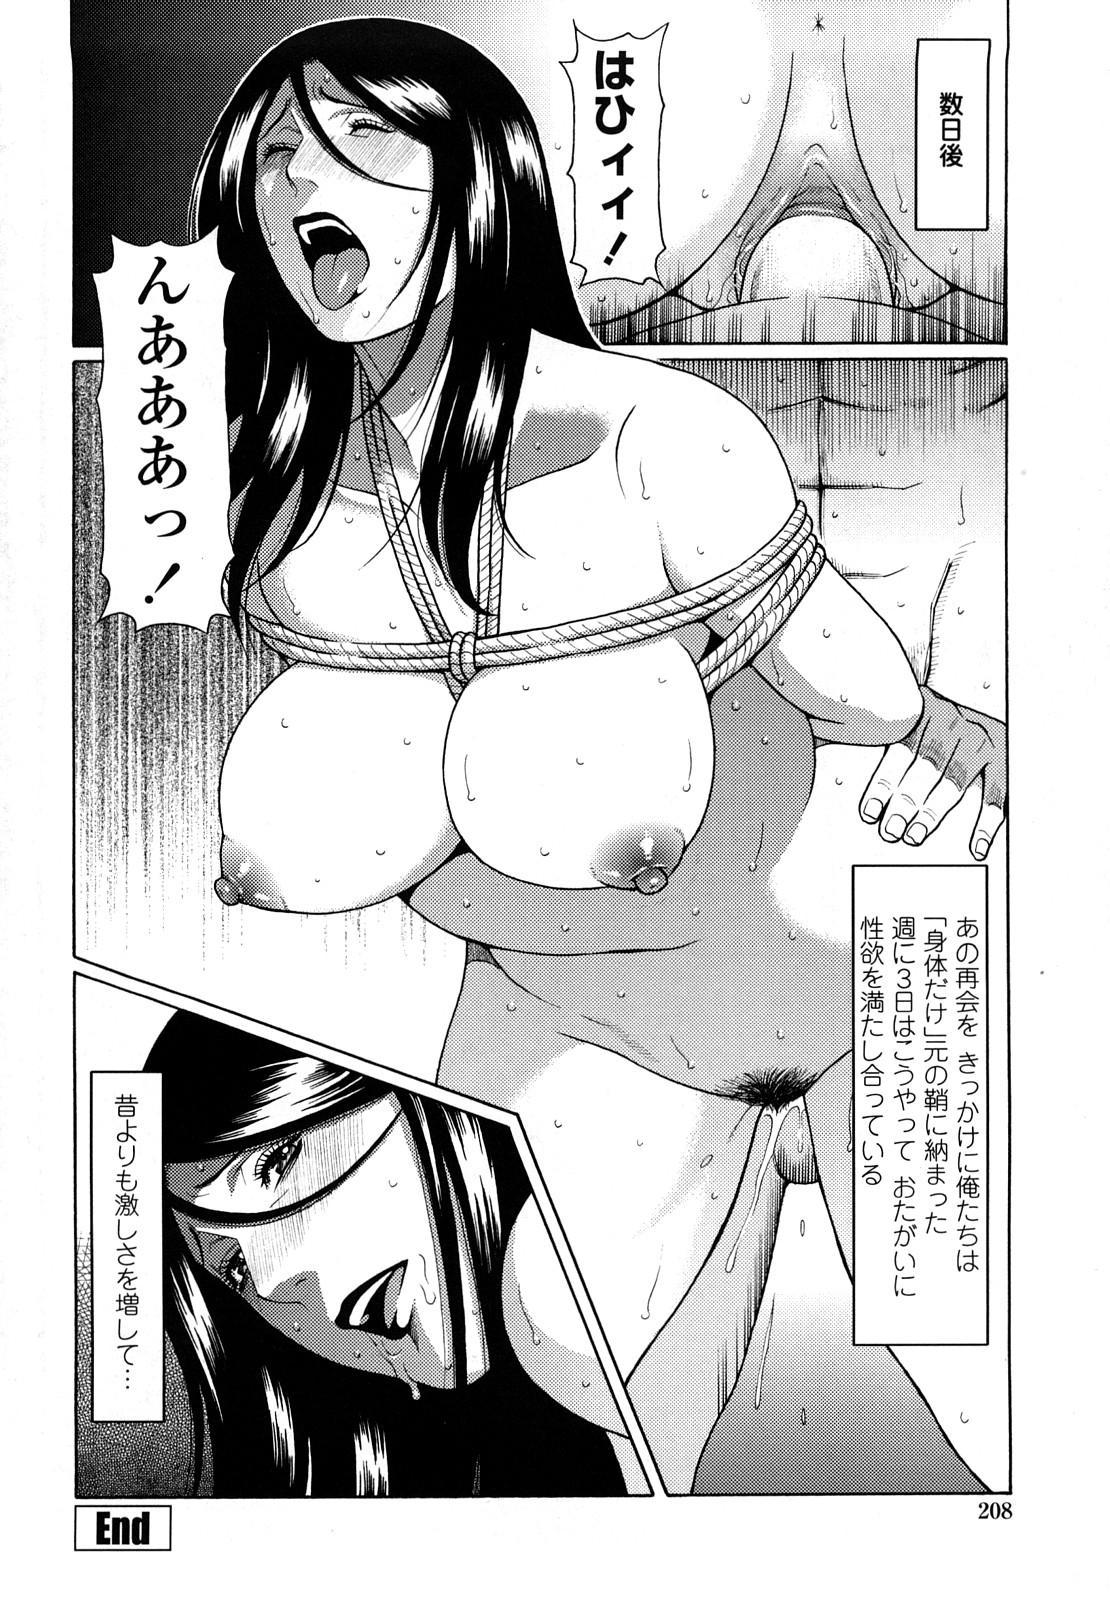 [Takasugi Kou] Kindan no Haha-Ana - Immorality Love-Hole [Decensored] 209